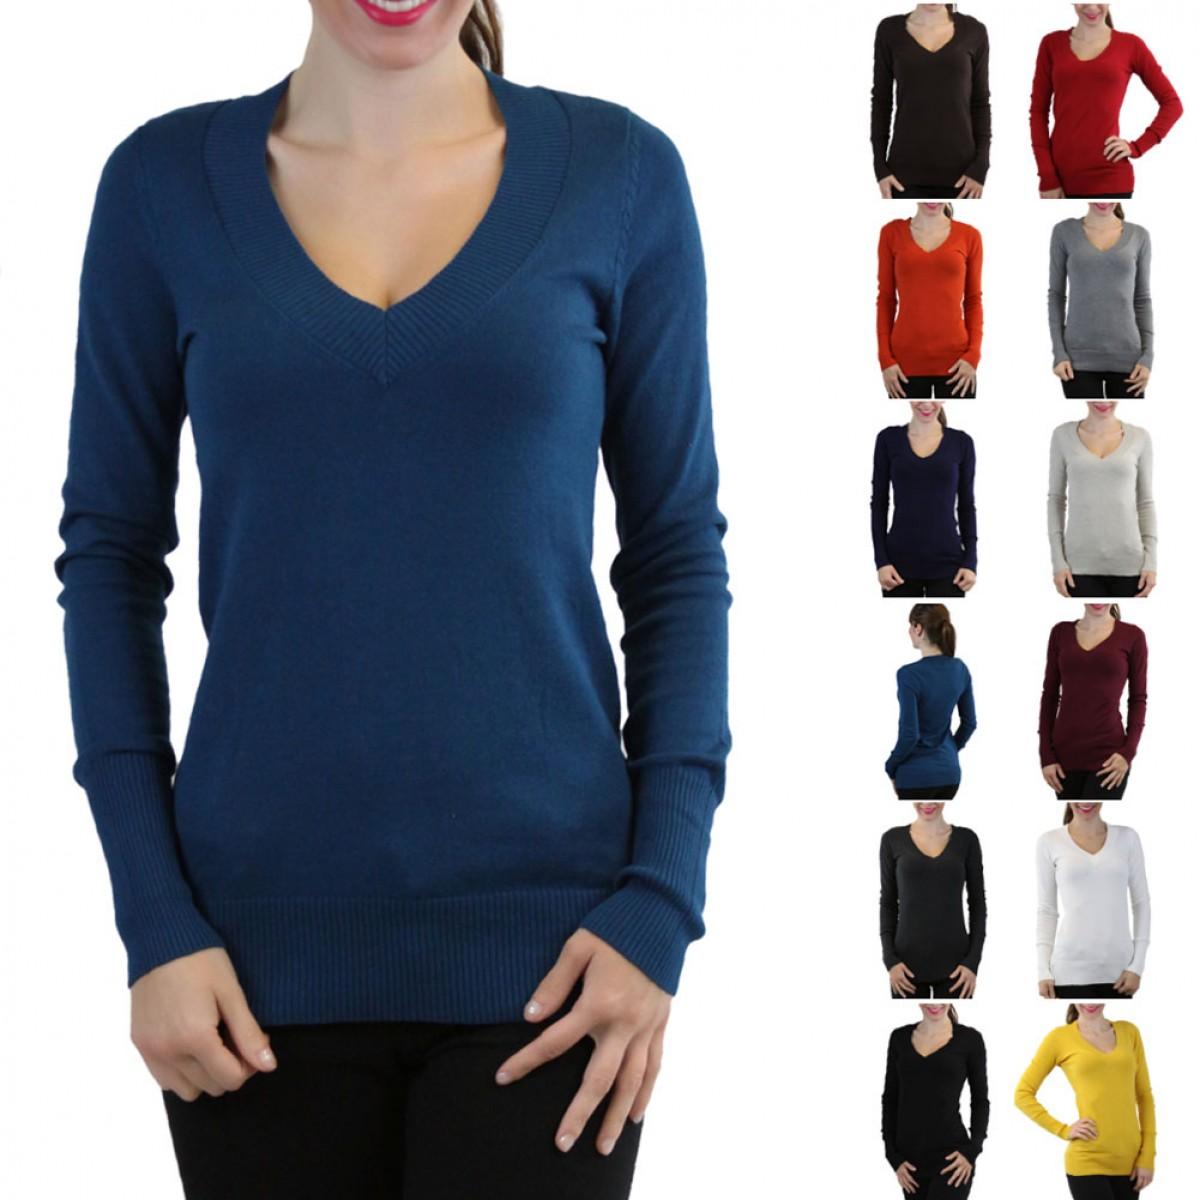 Cardigans/Sweaters - Tops - Women